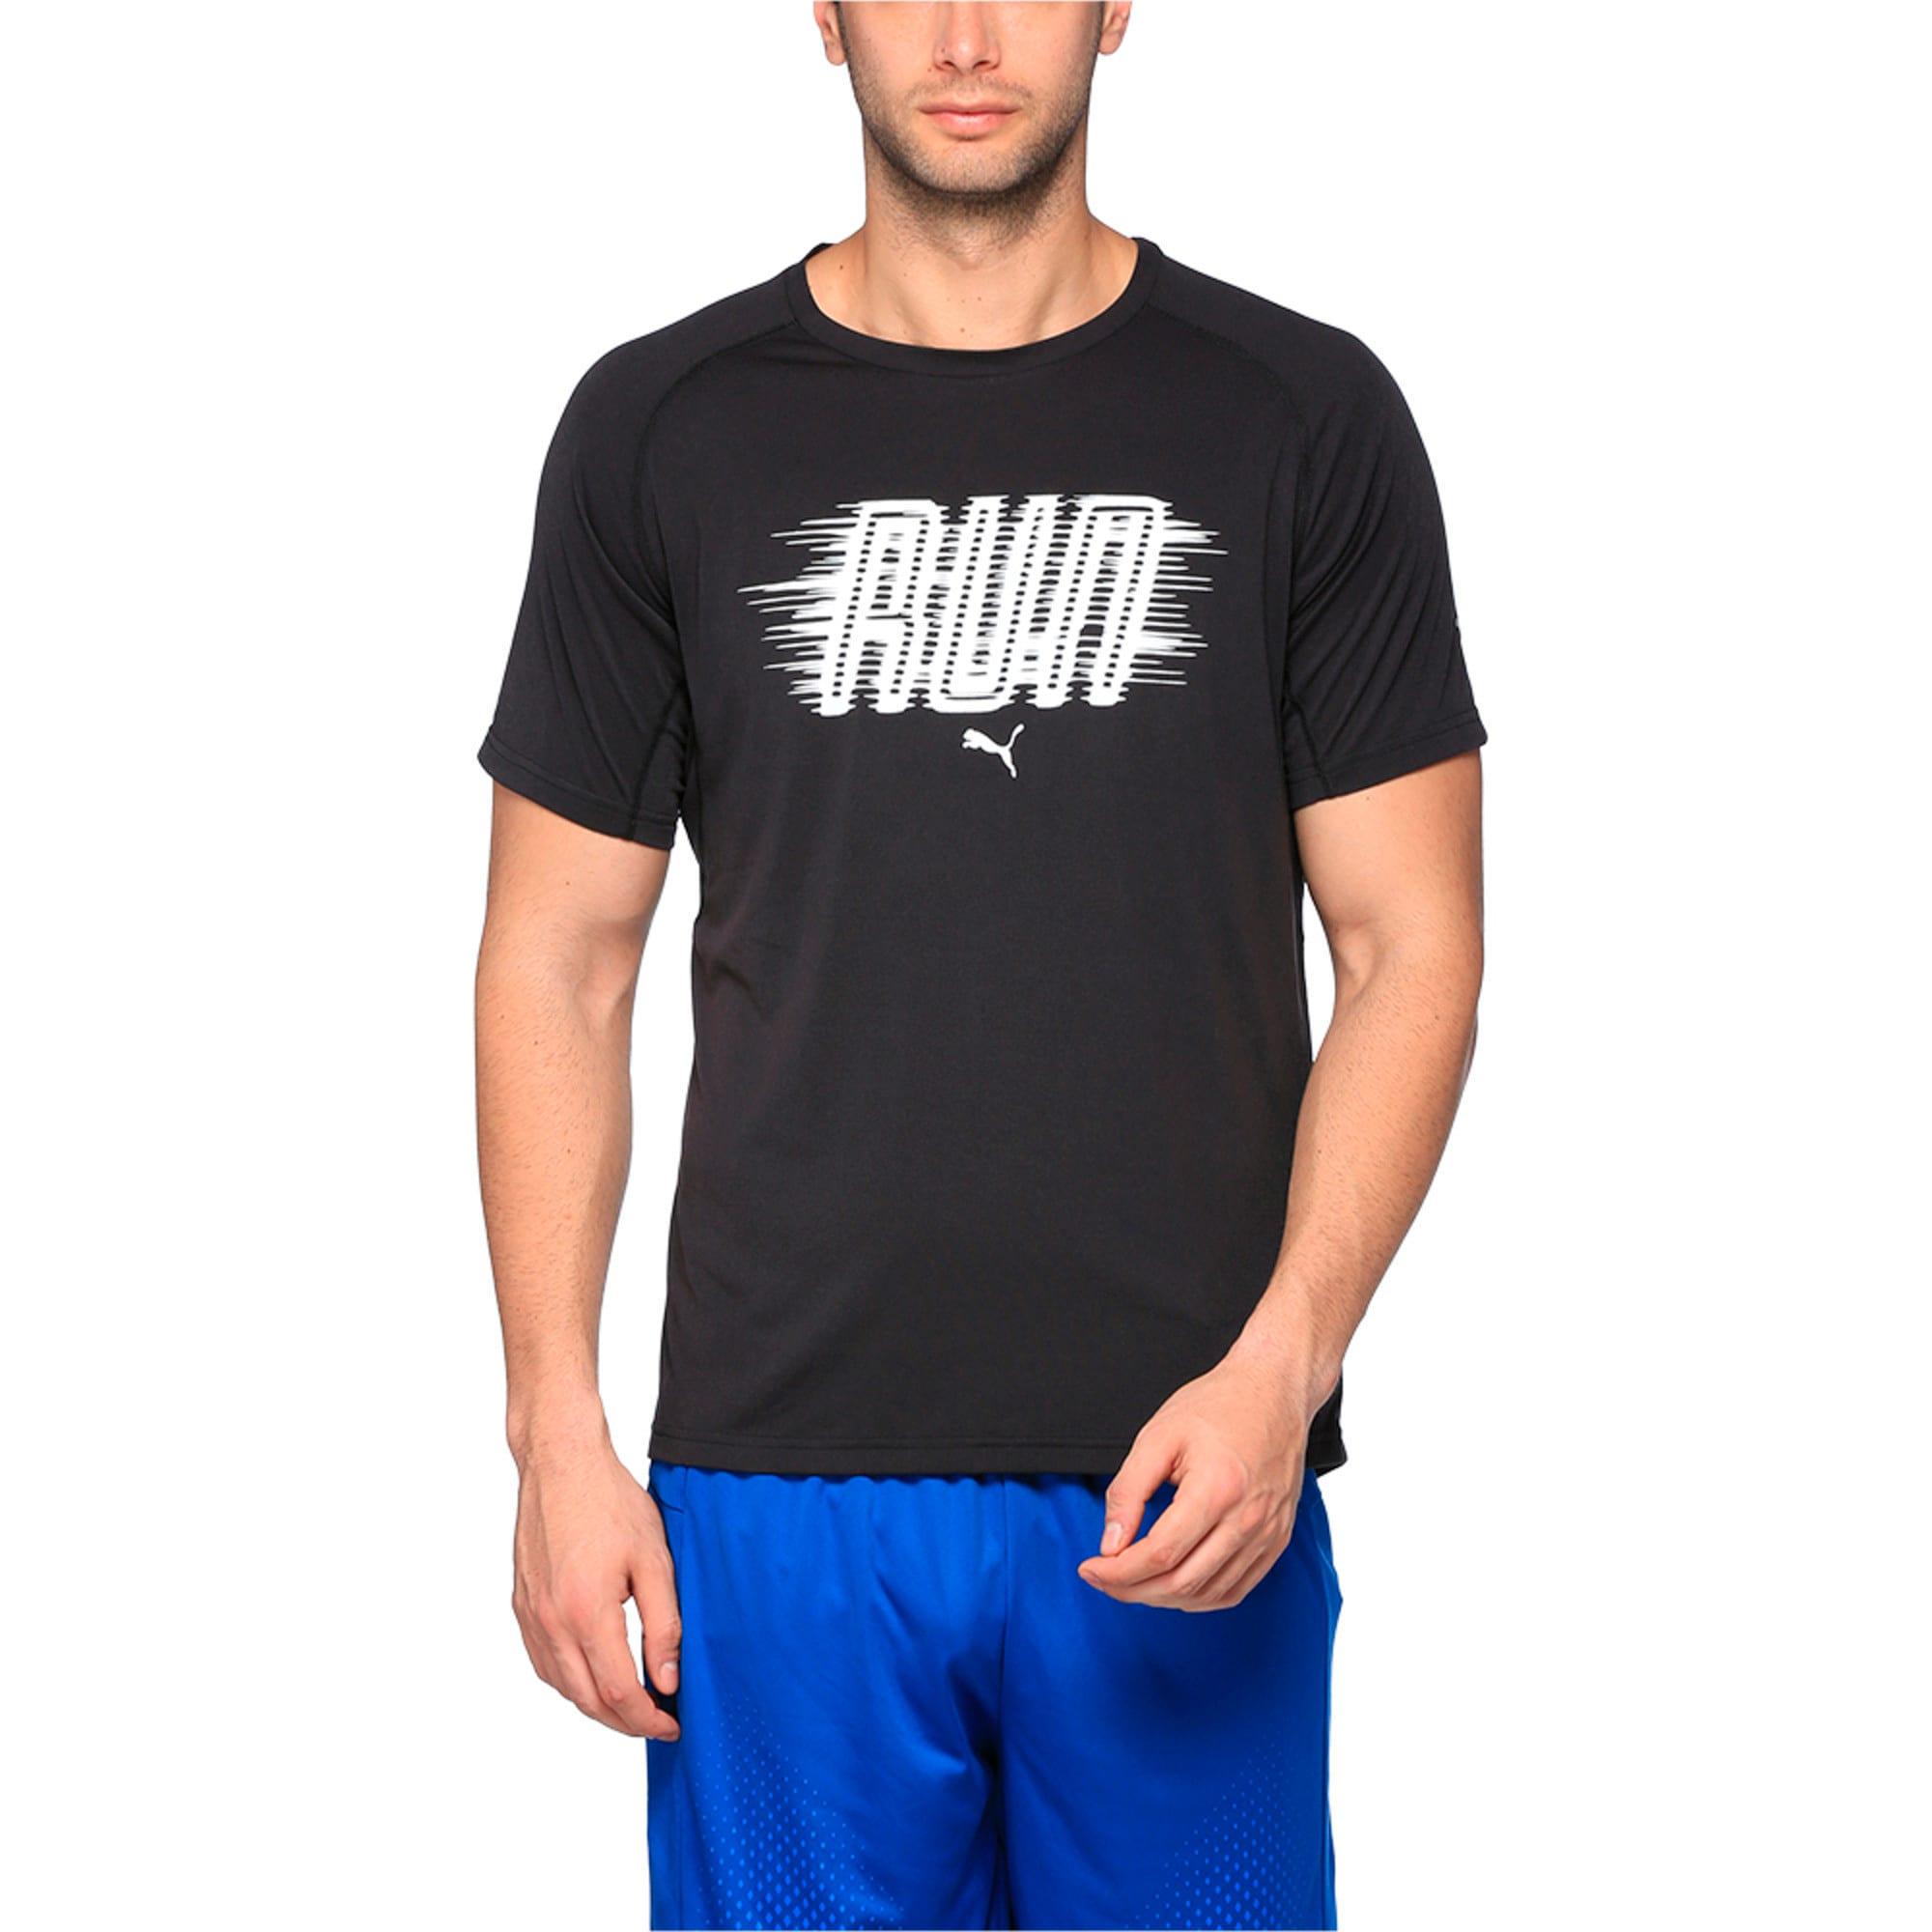 Thumbnail 2 of Running Men's Run T-Shirt, Puma Black Heather, medium-IND